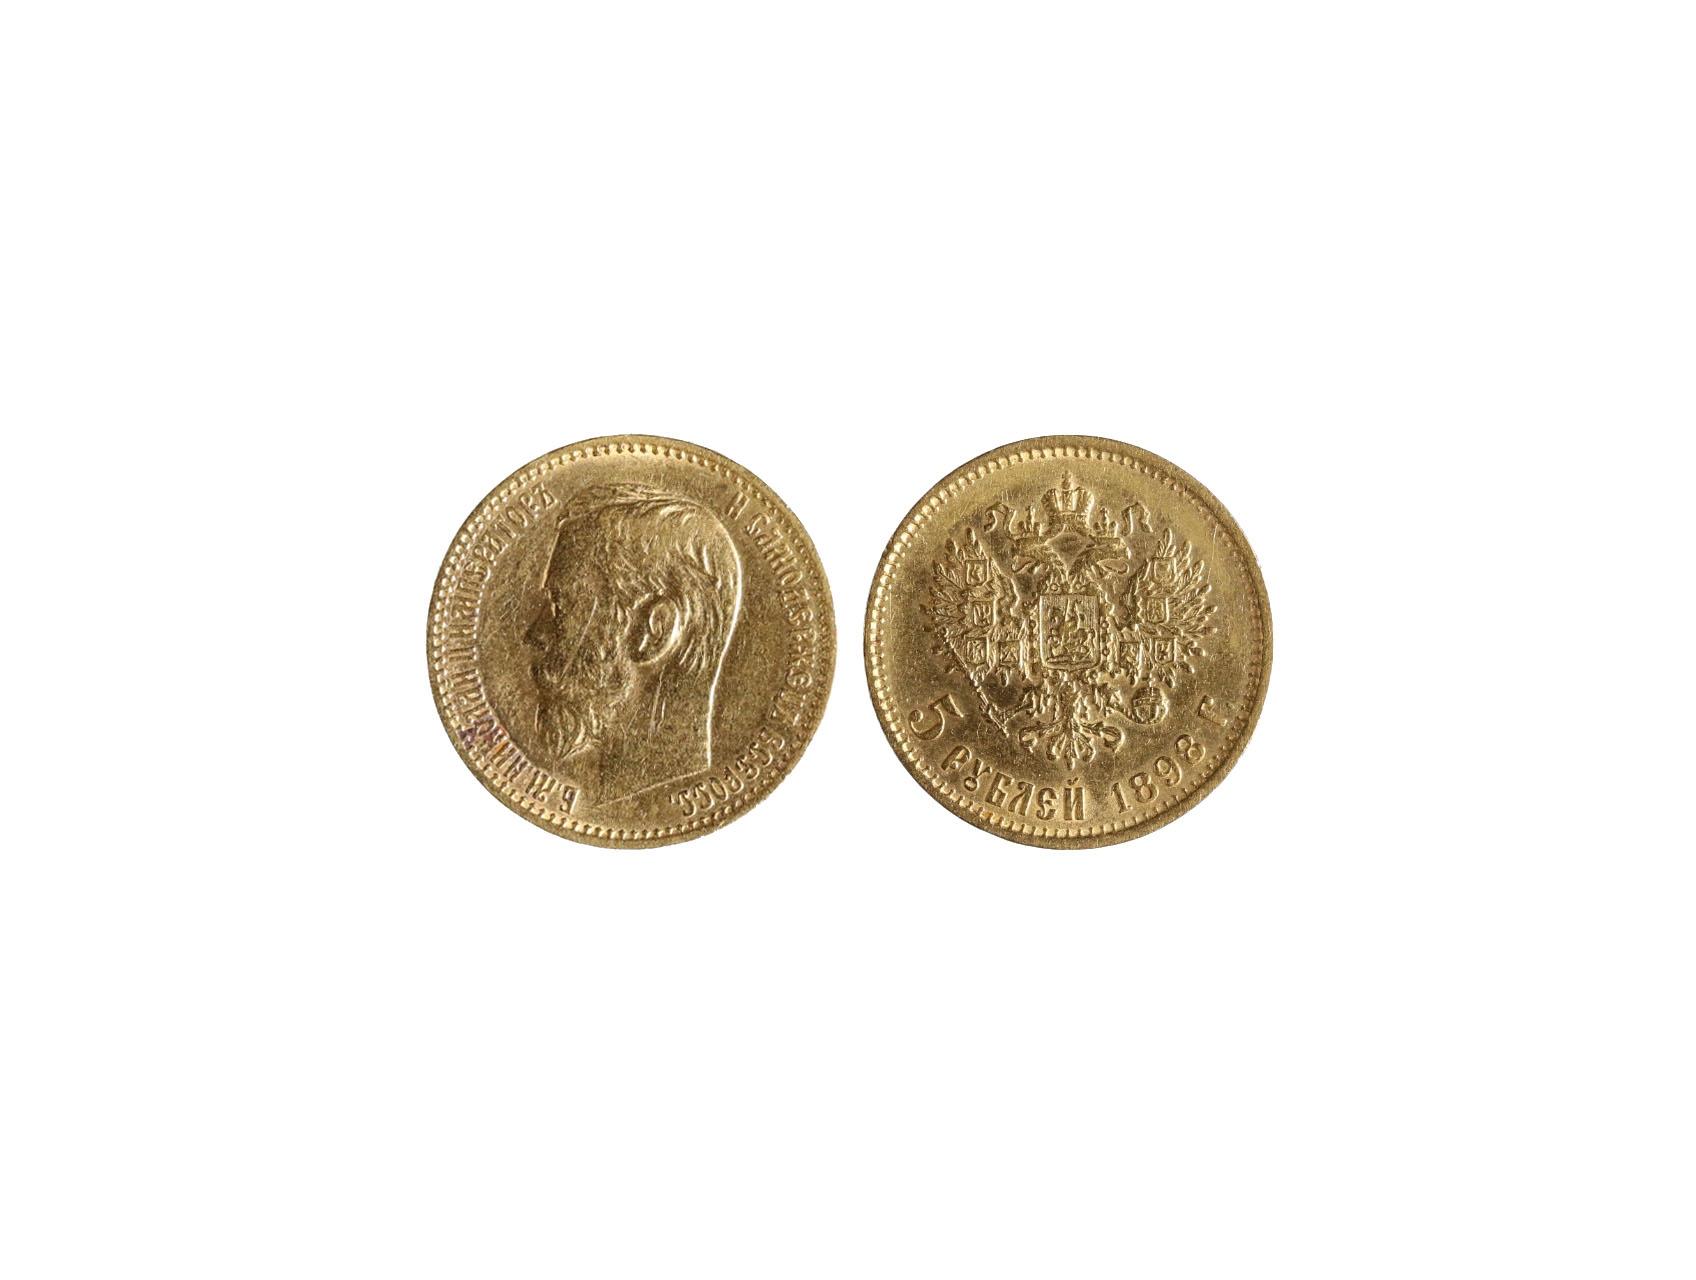 Rusko, Mikuláš II. 1894-1917 - 5 Rubl 1898 AG, Y62, hranky